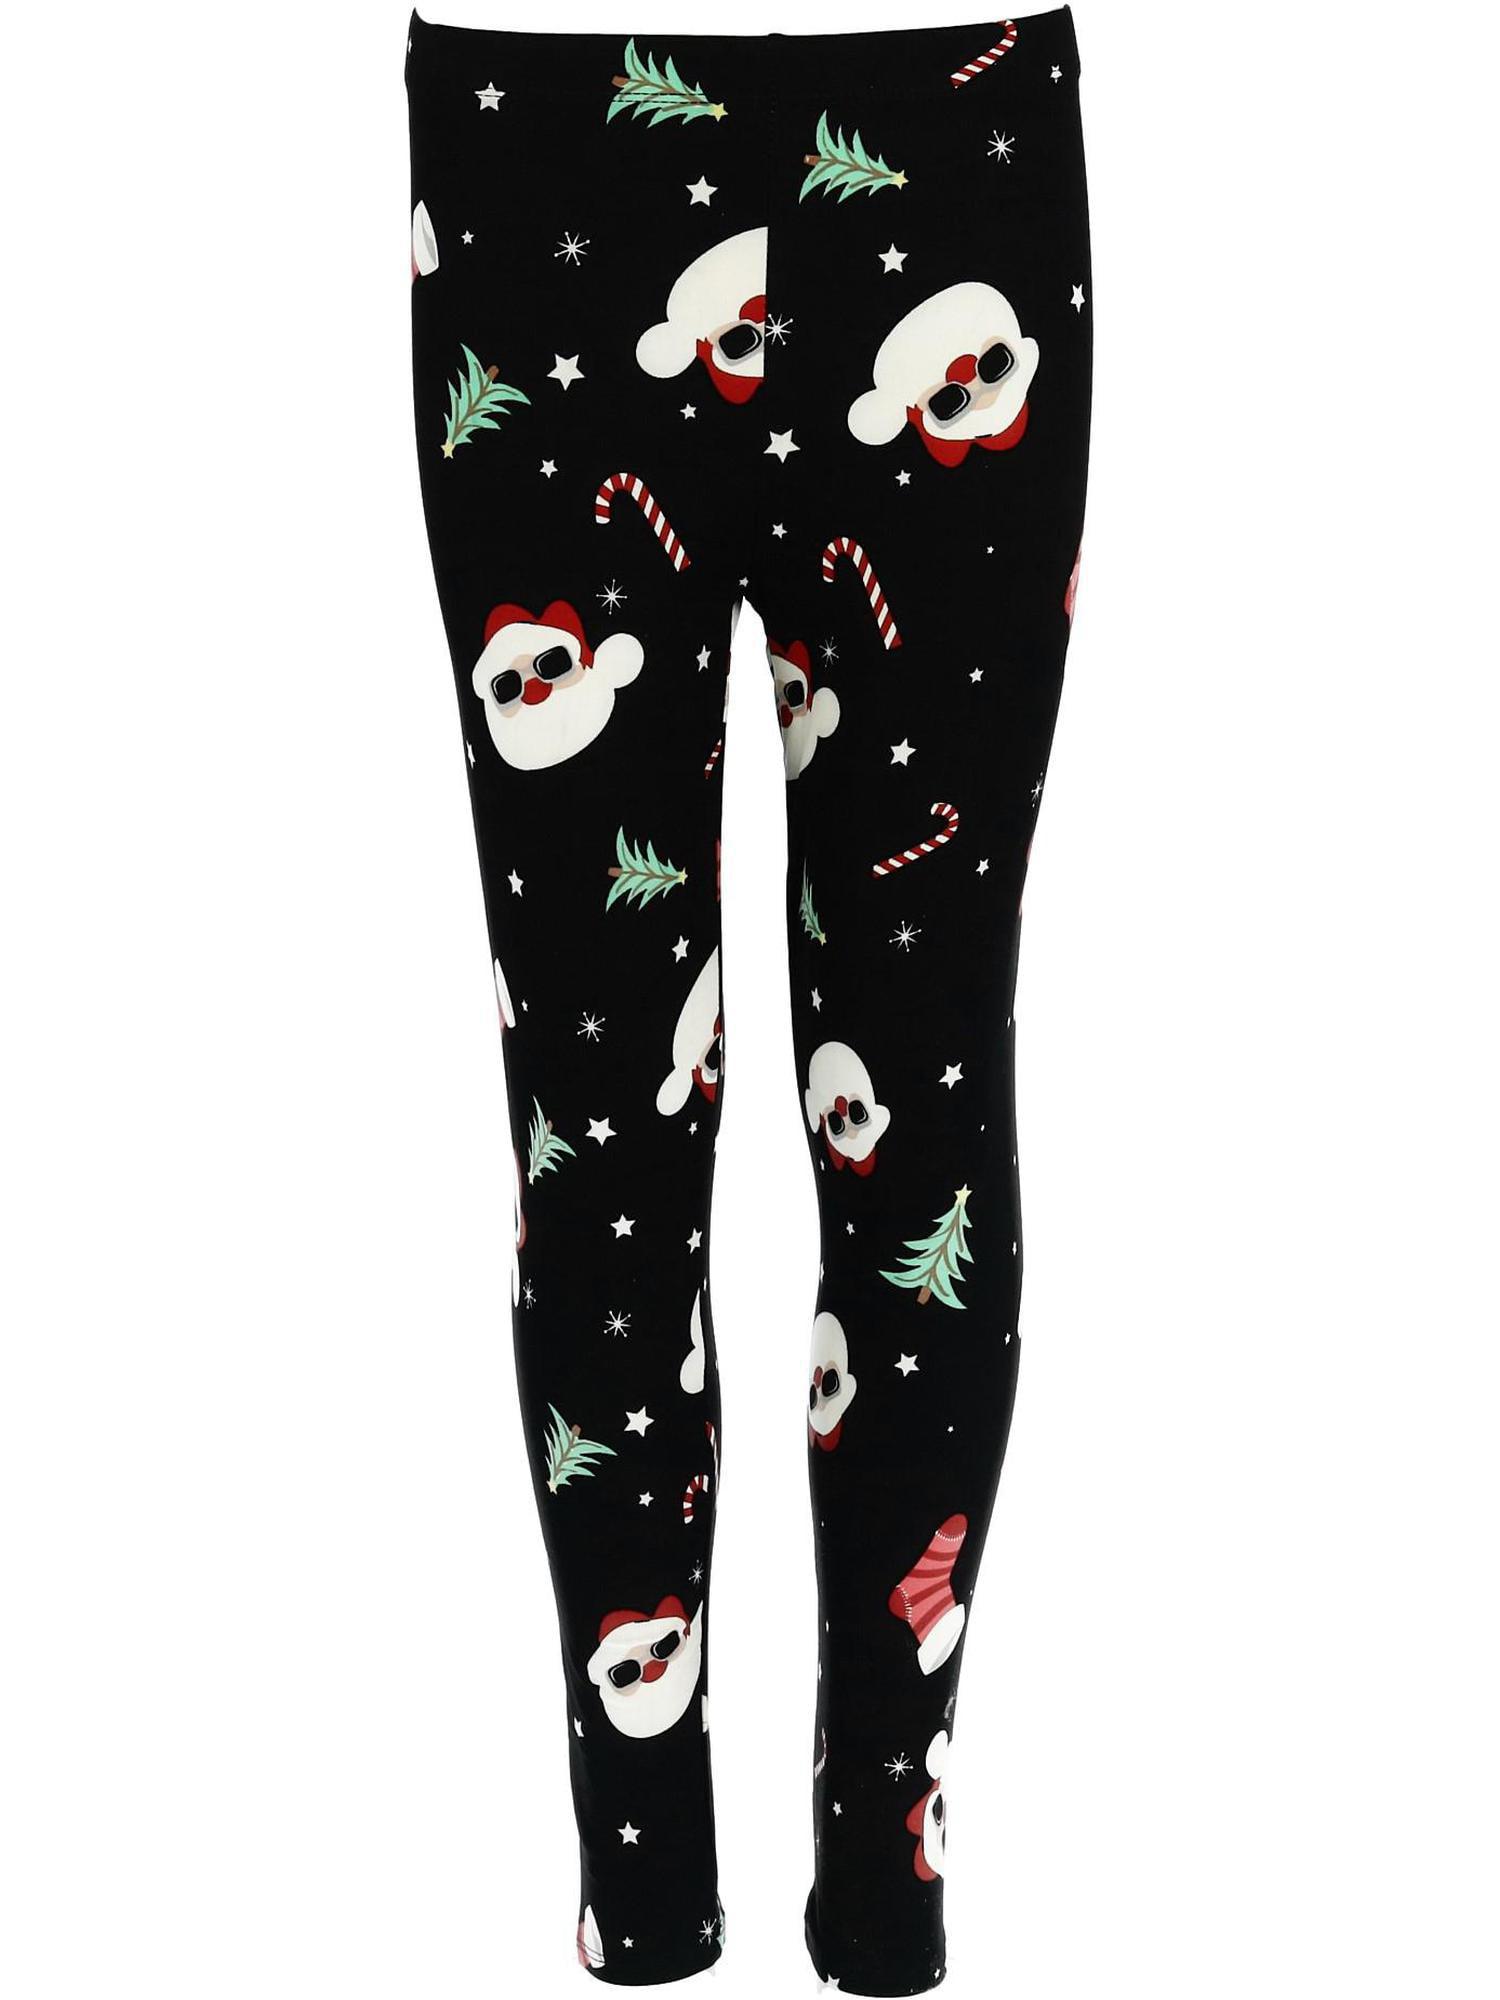 5e568f4a2e440 Just One - Girl's Santa Claus Print Christmas Holiday Leggings, Black -  Walmart.com